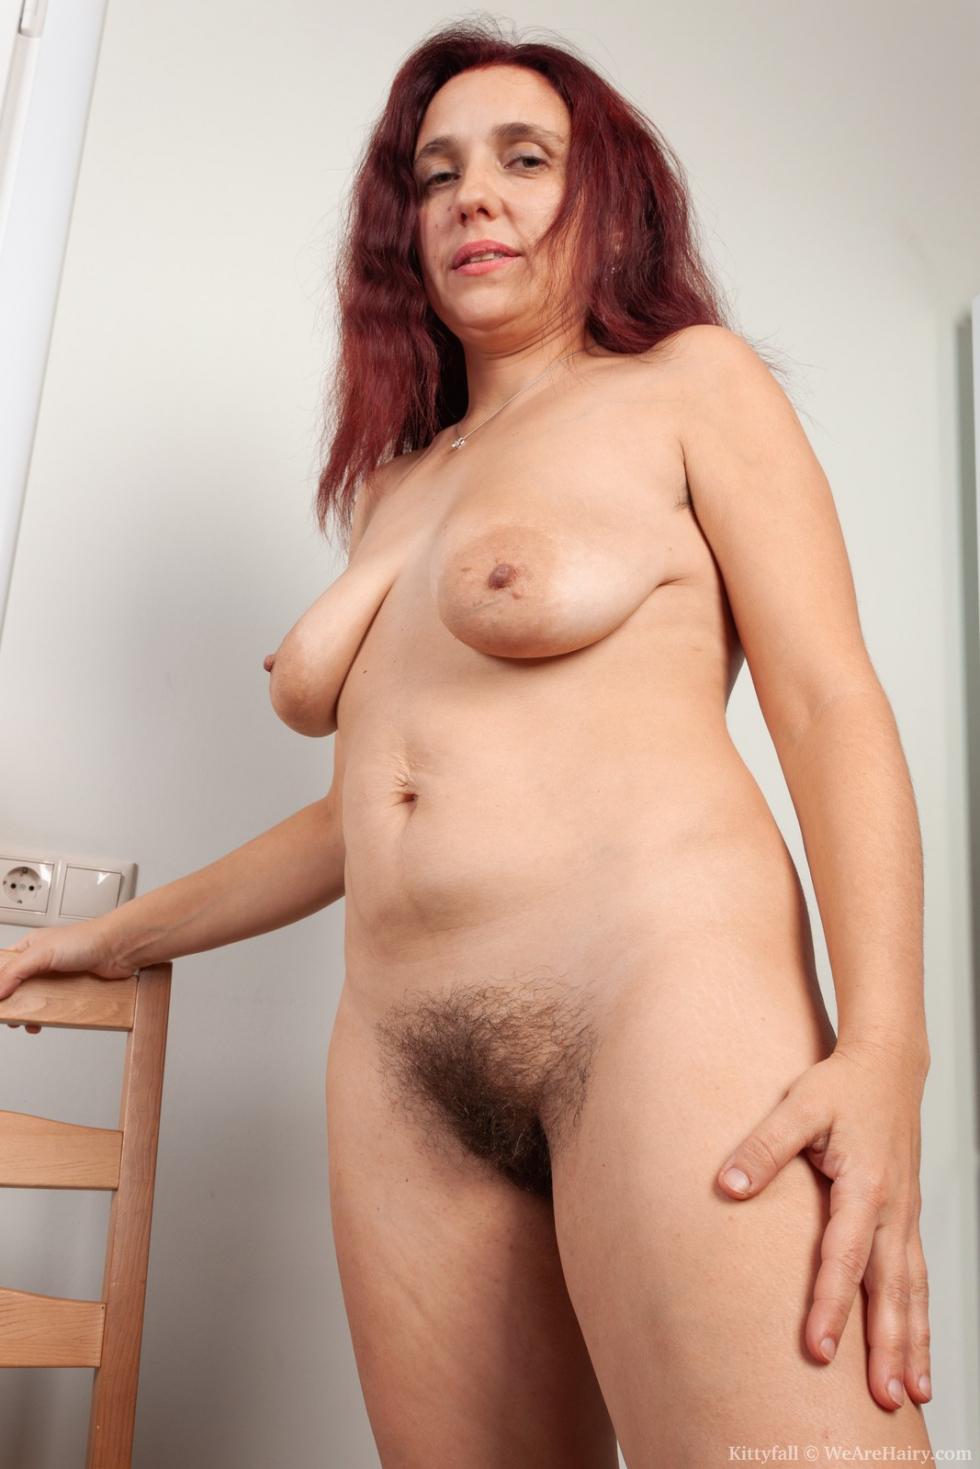 Naked new streak strip topless year